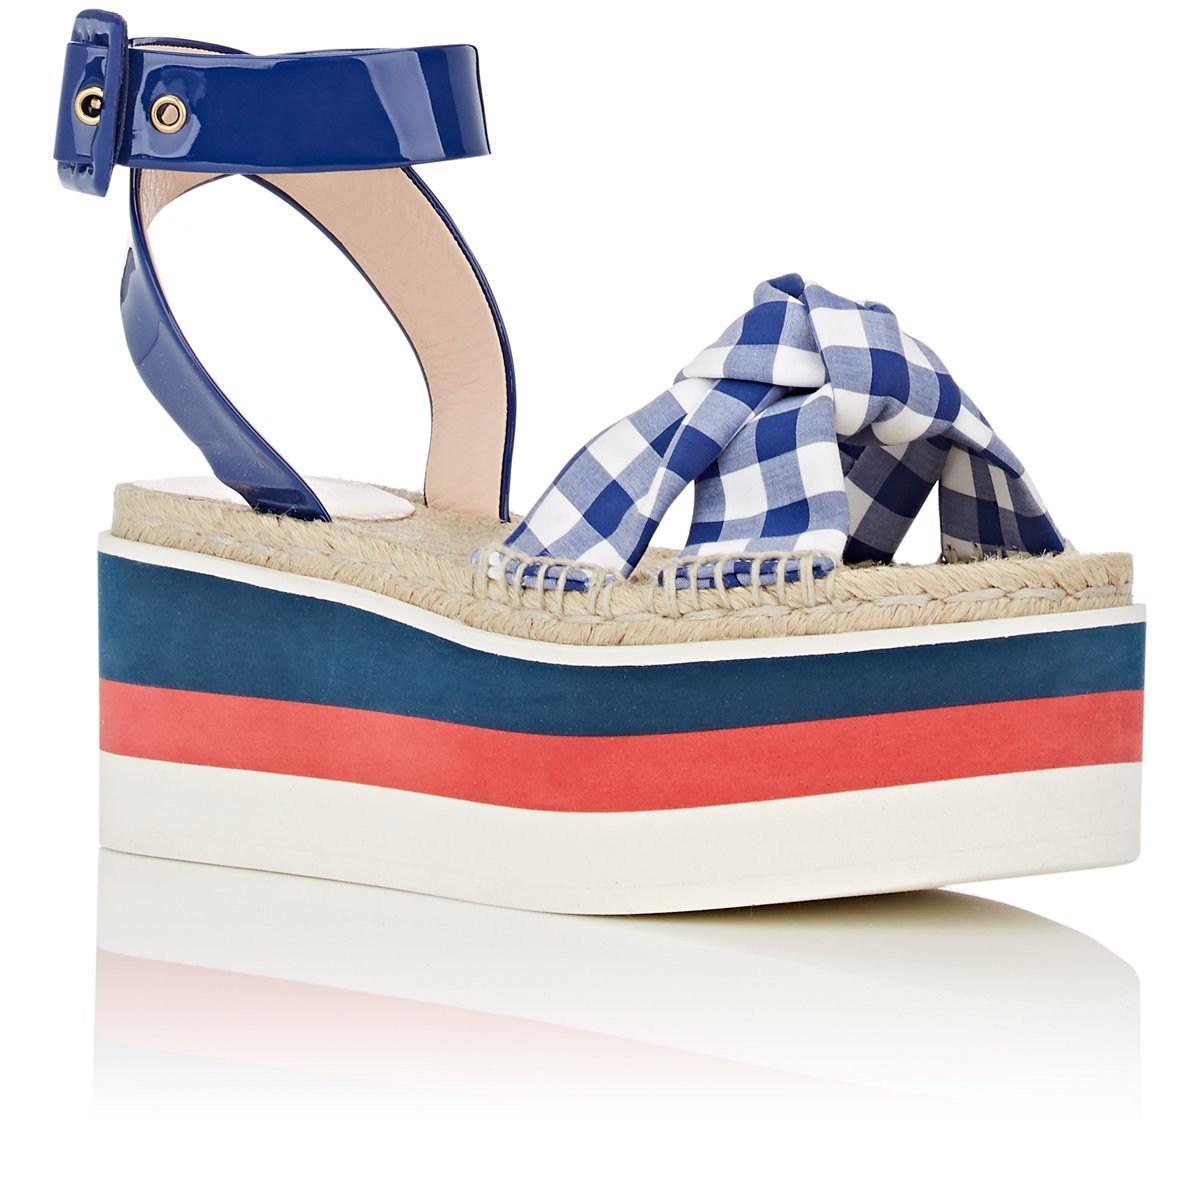 029c3afd9 Lyst - Gucci Crisscross-strap Gingham Platform Sandals in Blue